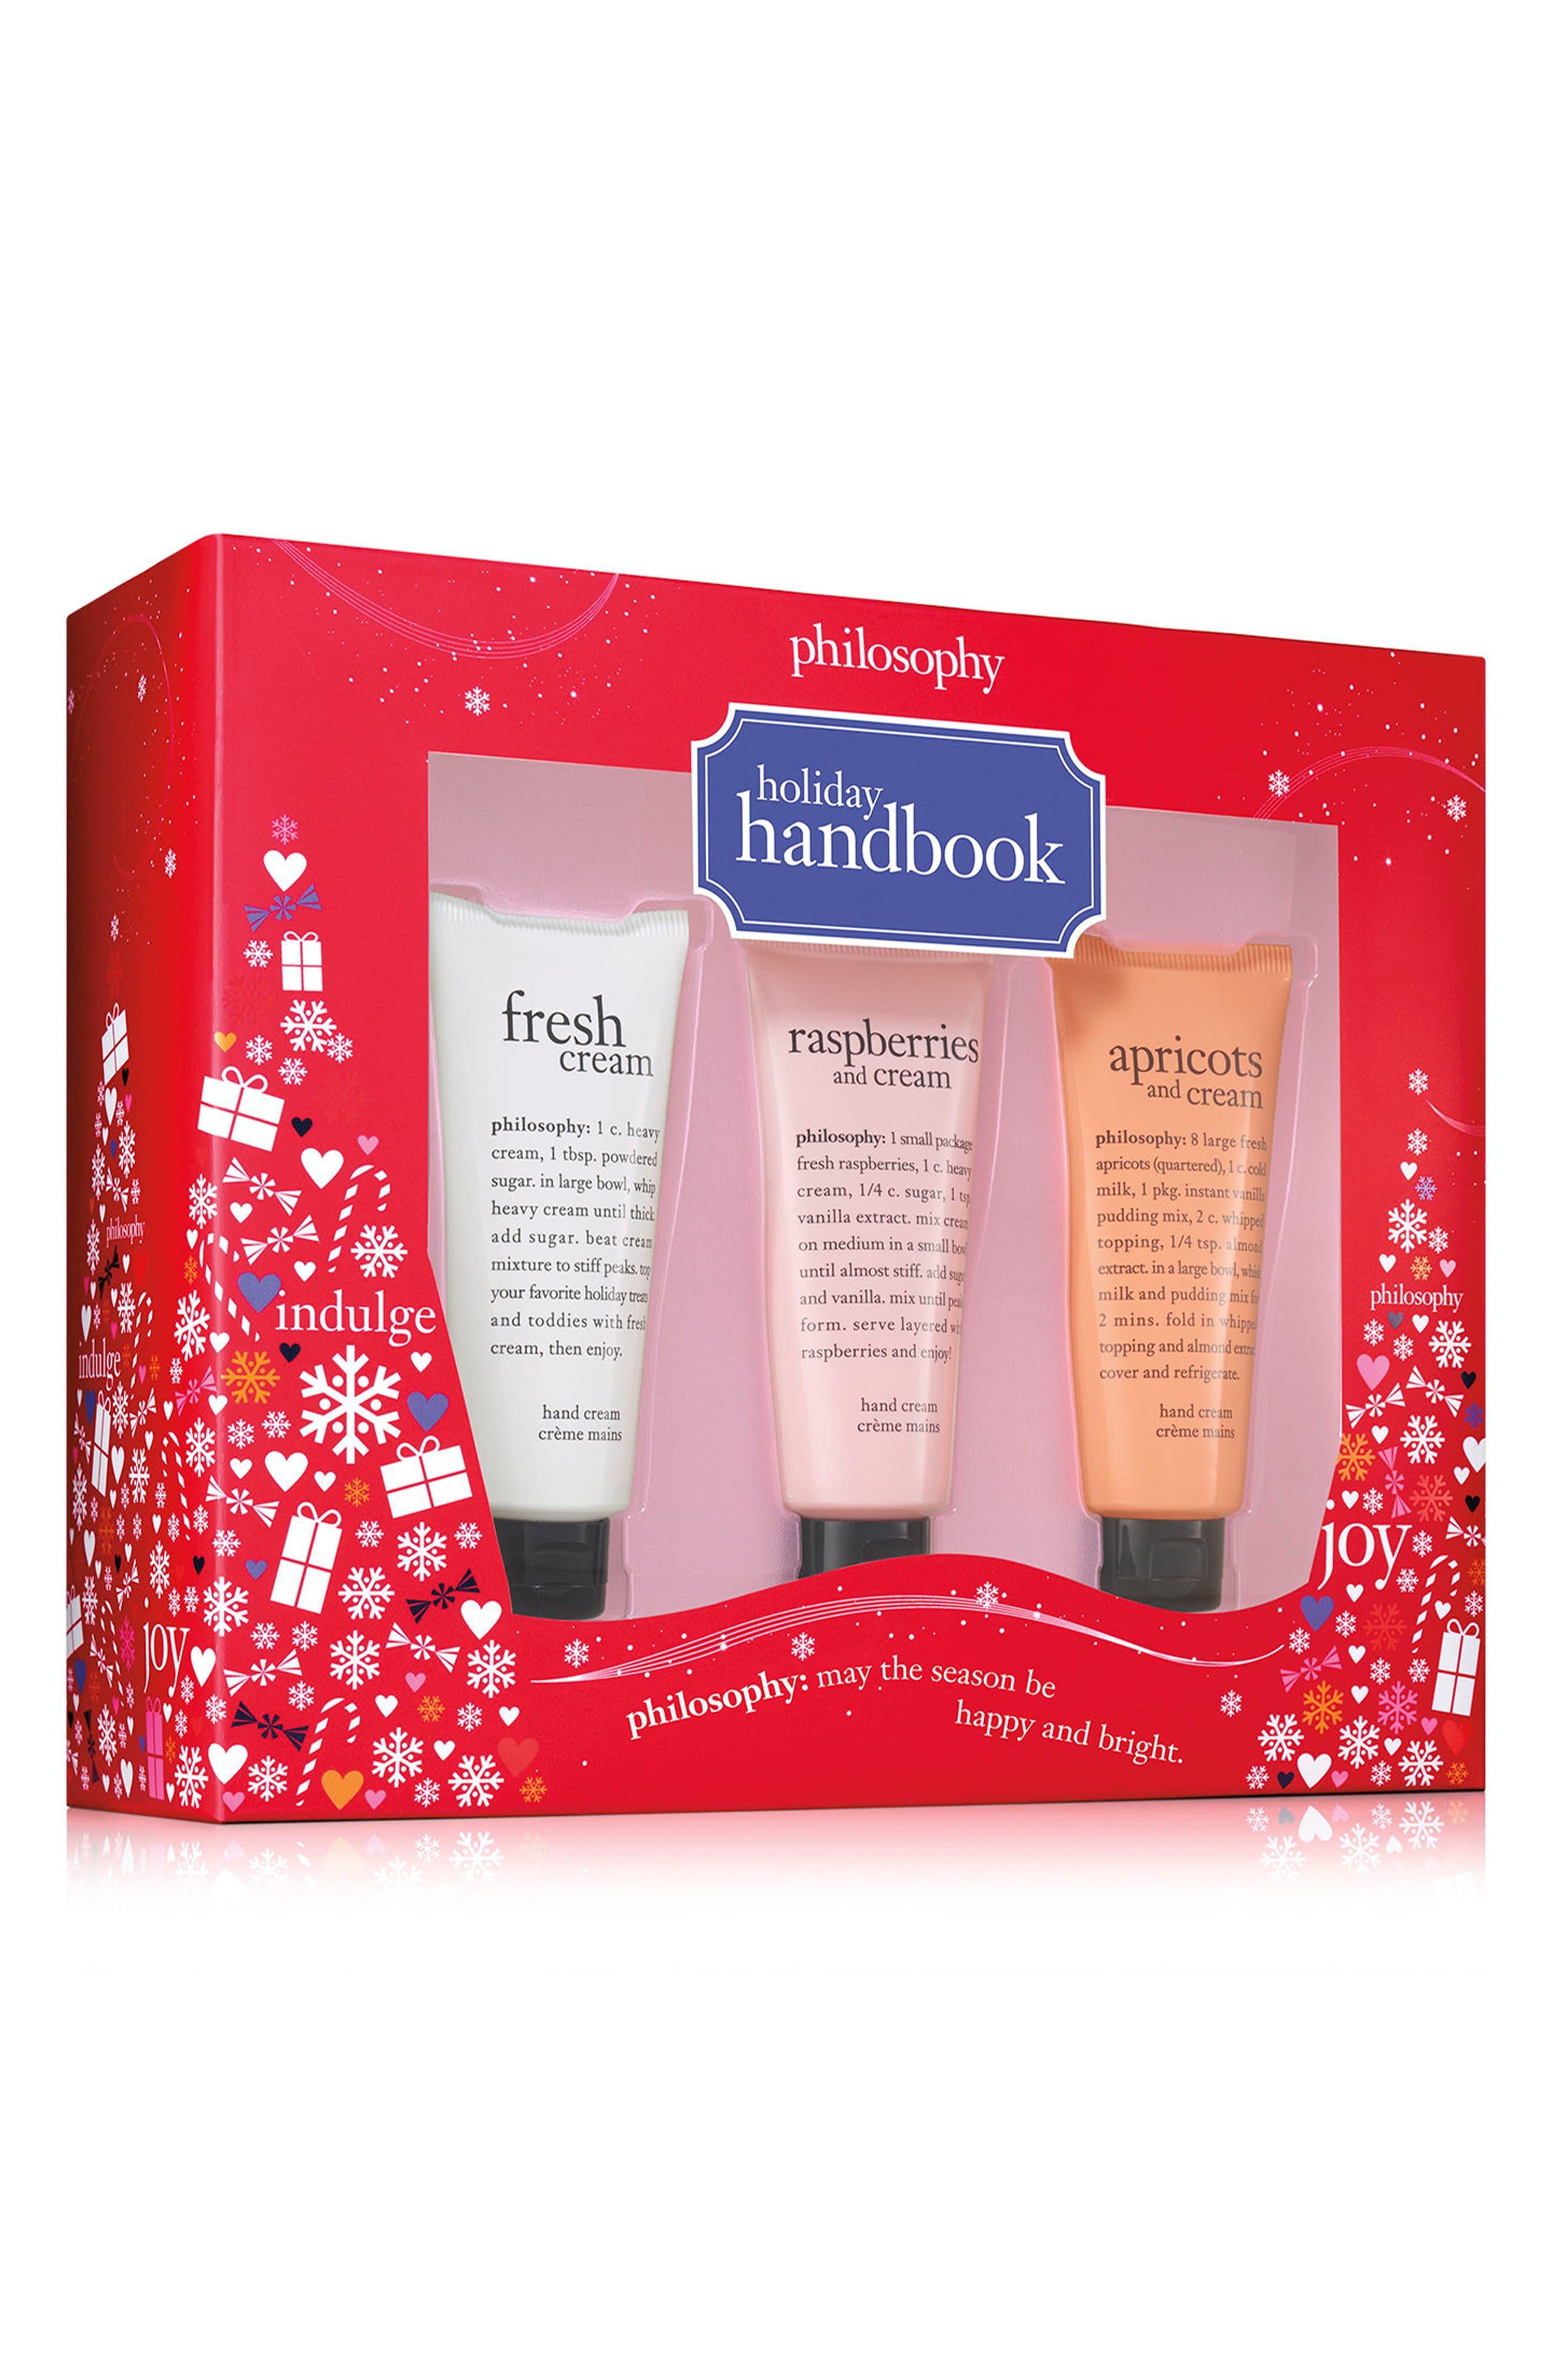 philosophy holiday handbook set (Limited Edition)